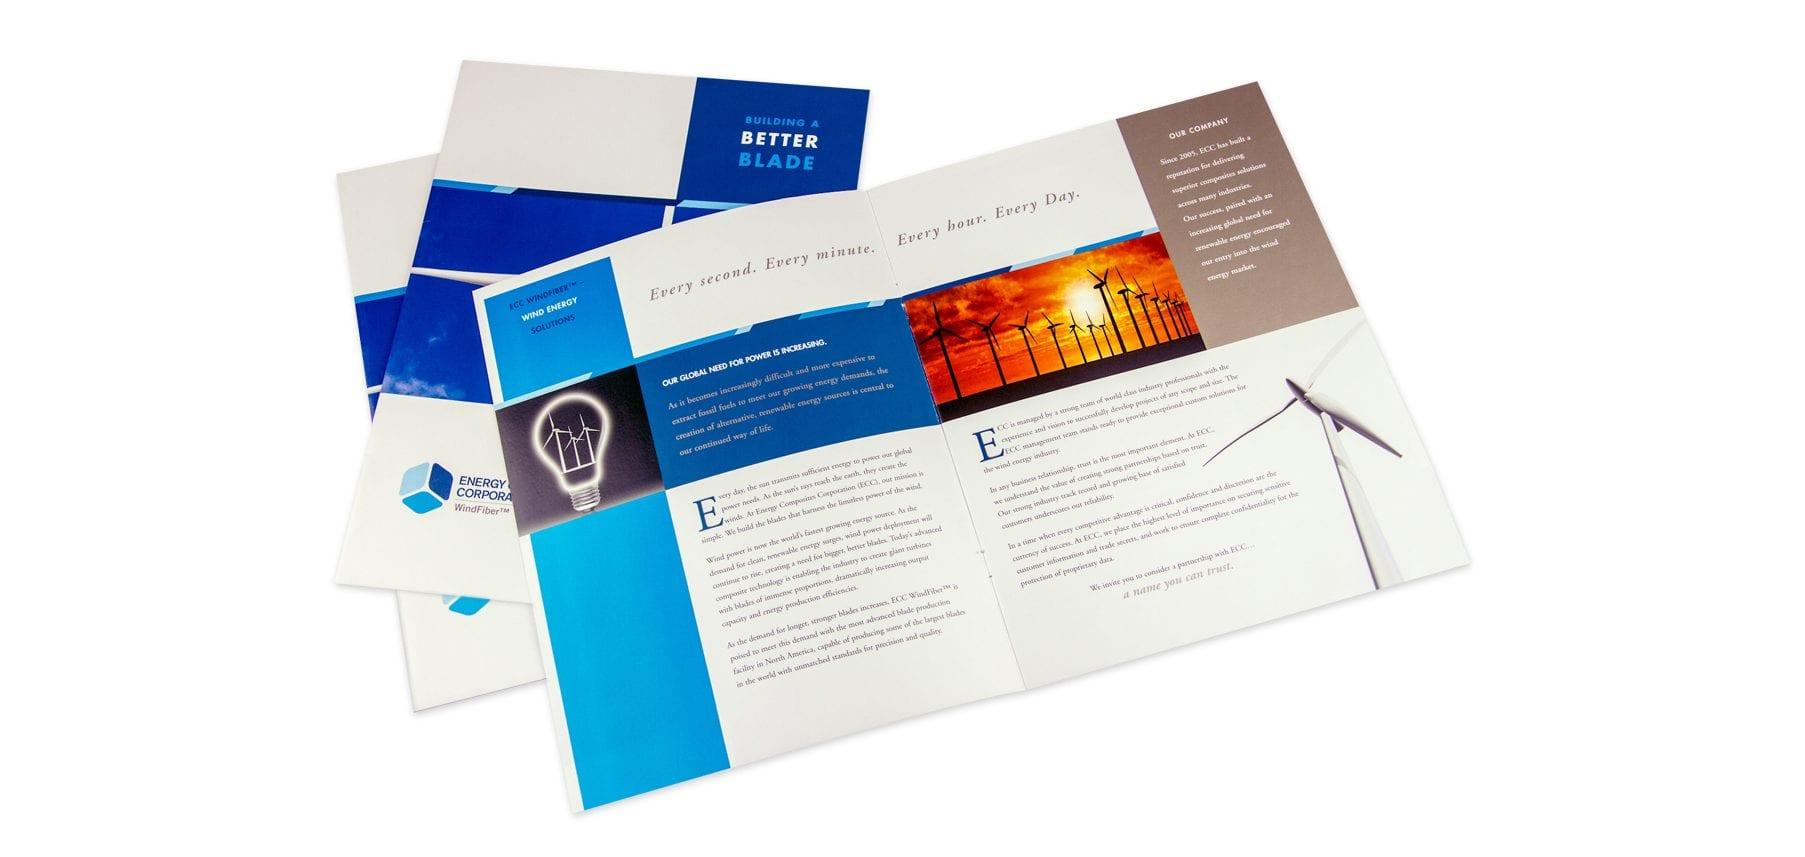 Energy Composites Corporation